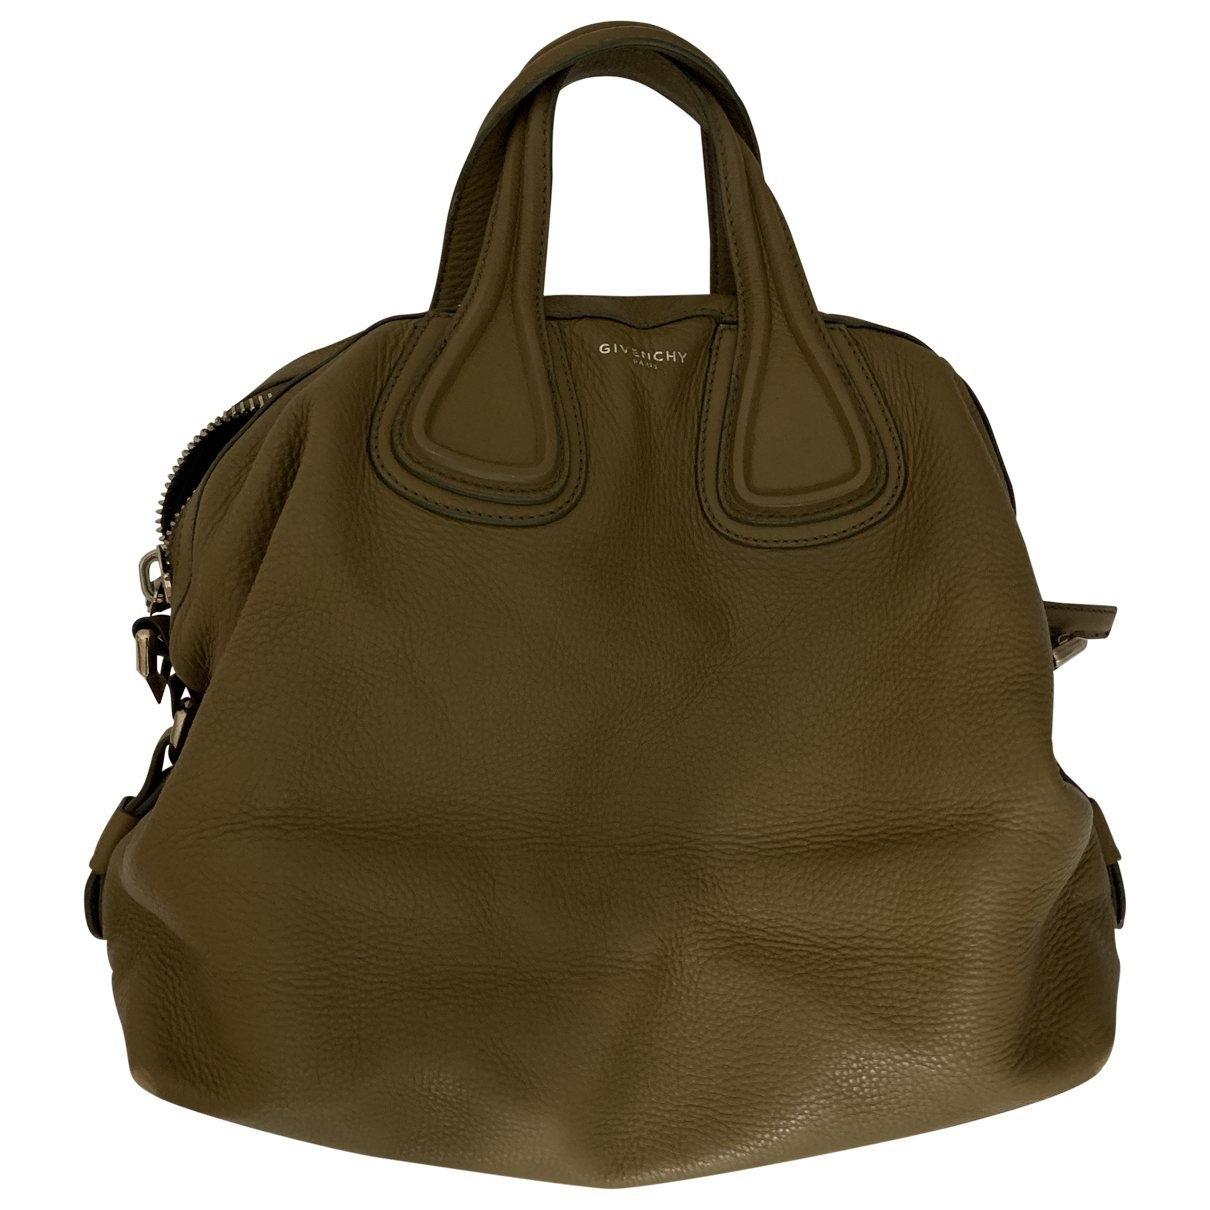 Givenchy - Sac a main Nightingale pour femme en cuir - vert